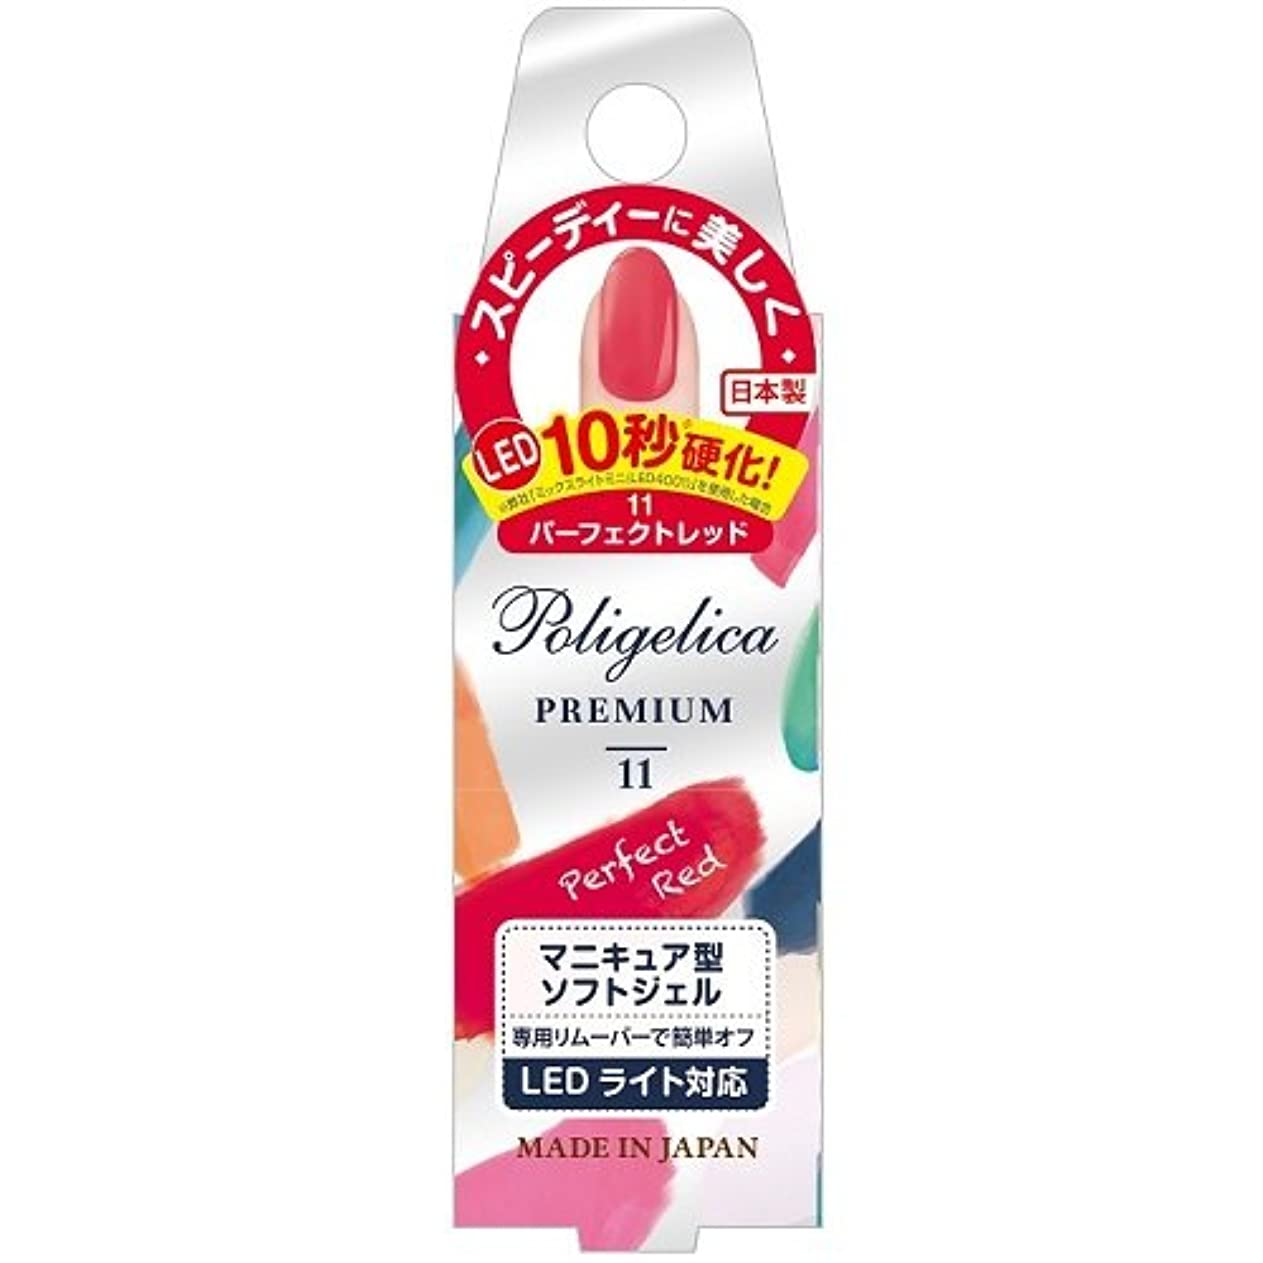 BW ポリジェリカプレミアム カラージェル 1011/パーフェクトレッド (6g)